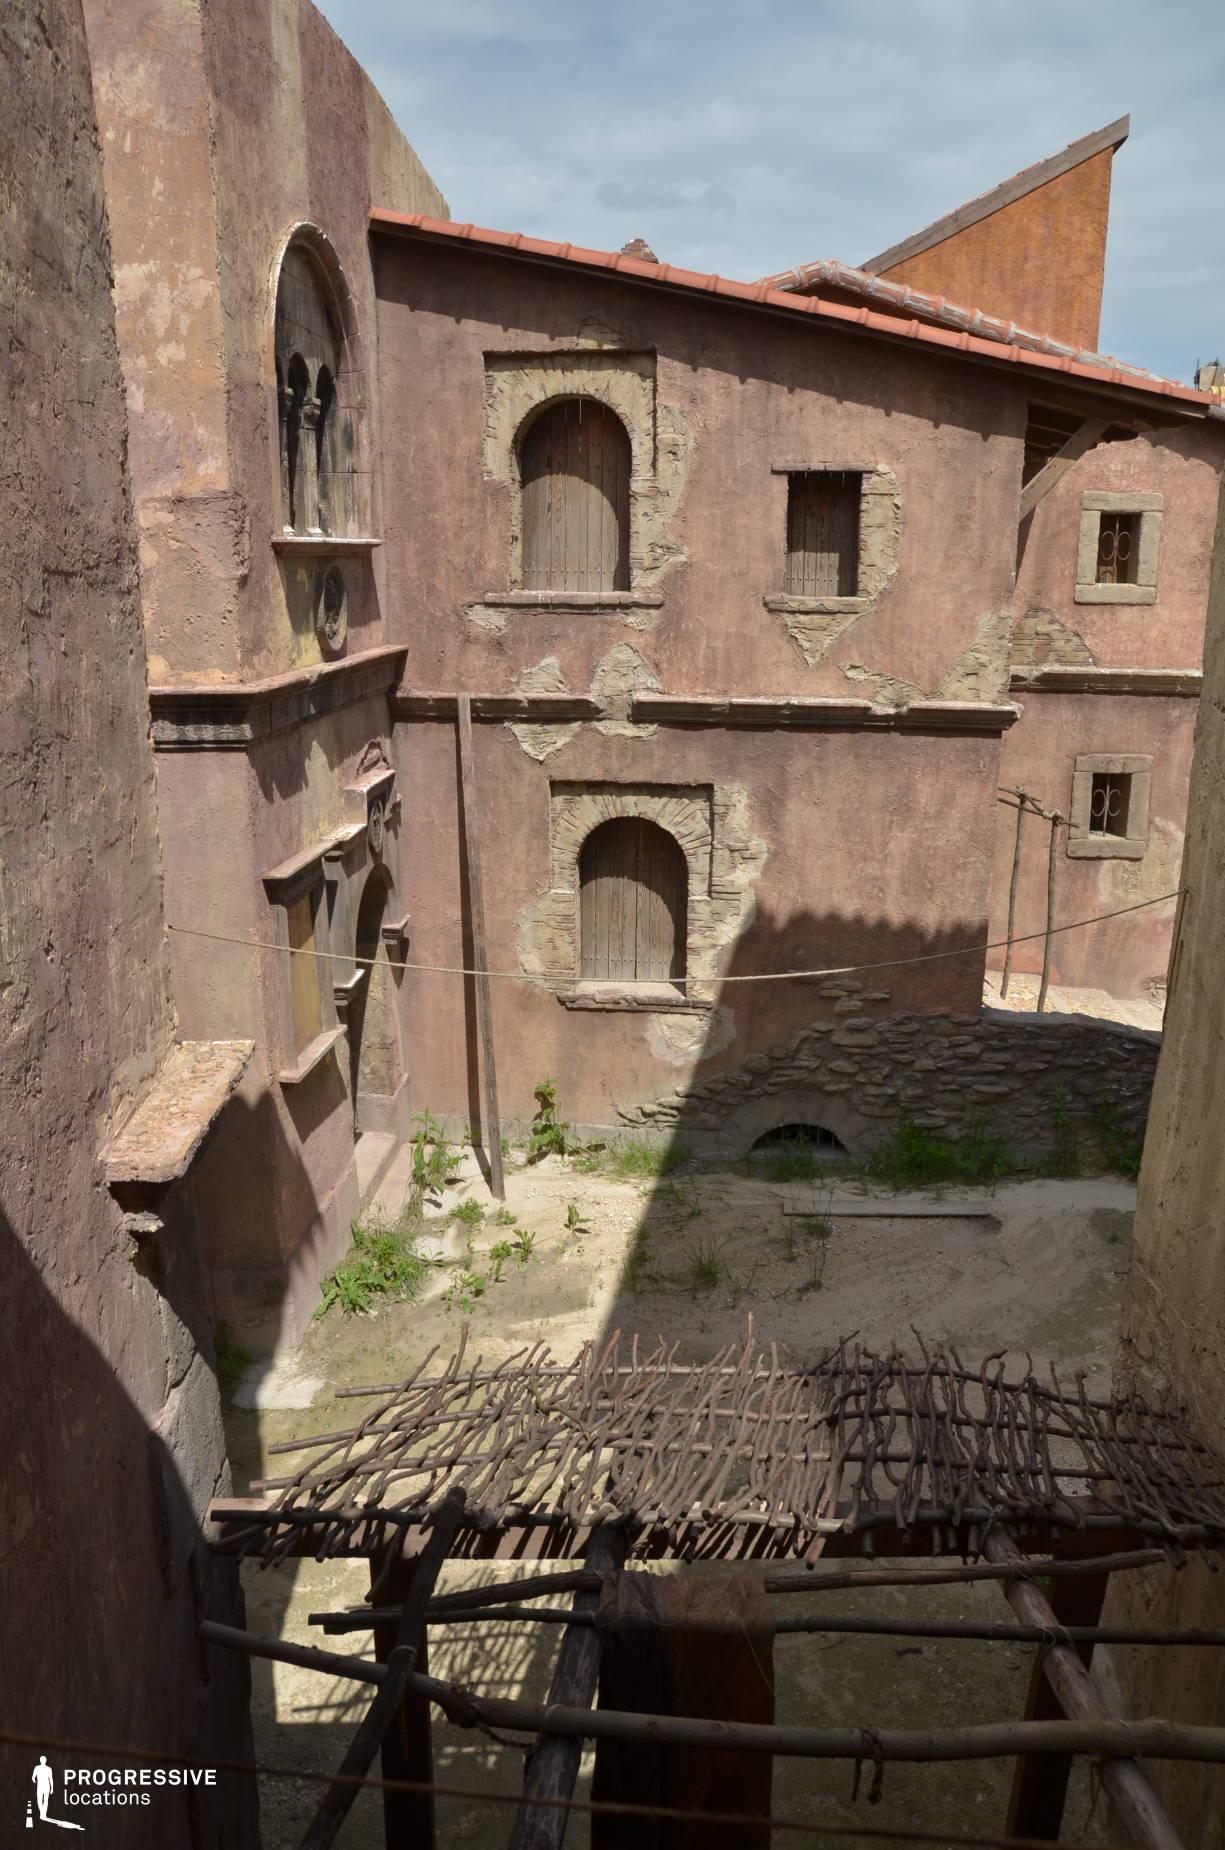 Renaissance City Backlot: Alley, Narrow Street